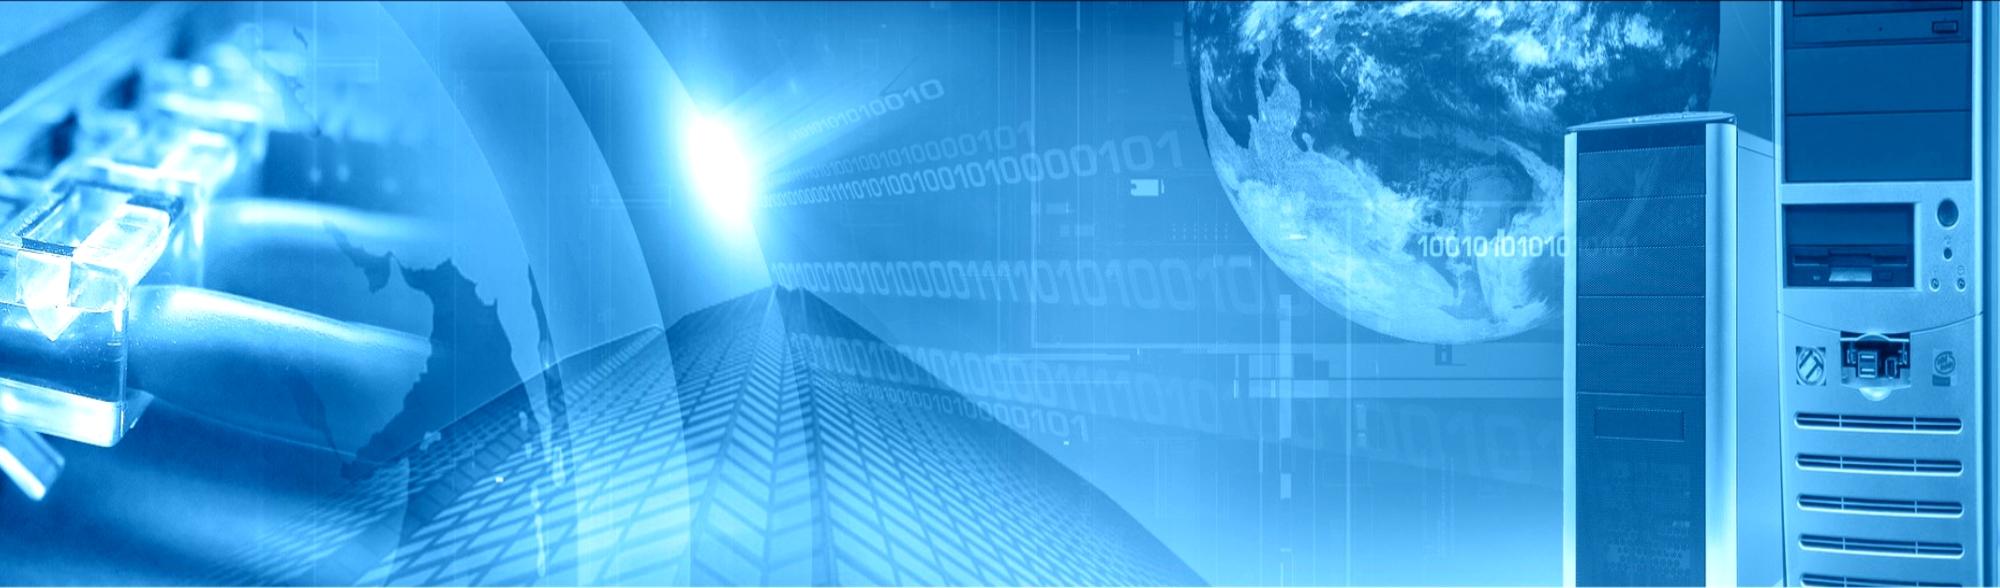 Equipamentos de Rede de TI